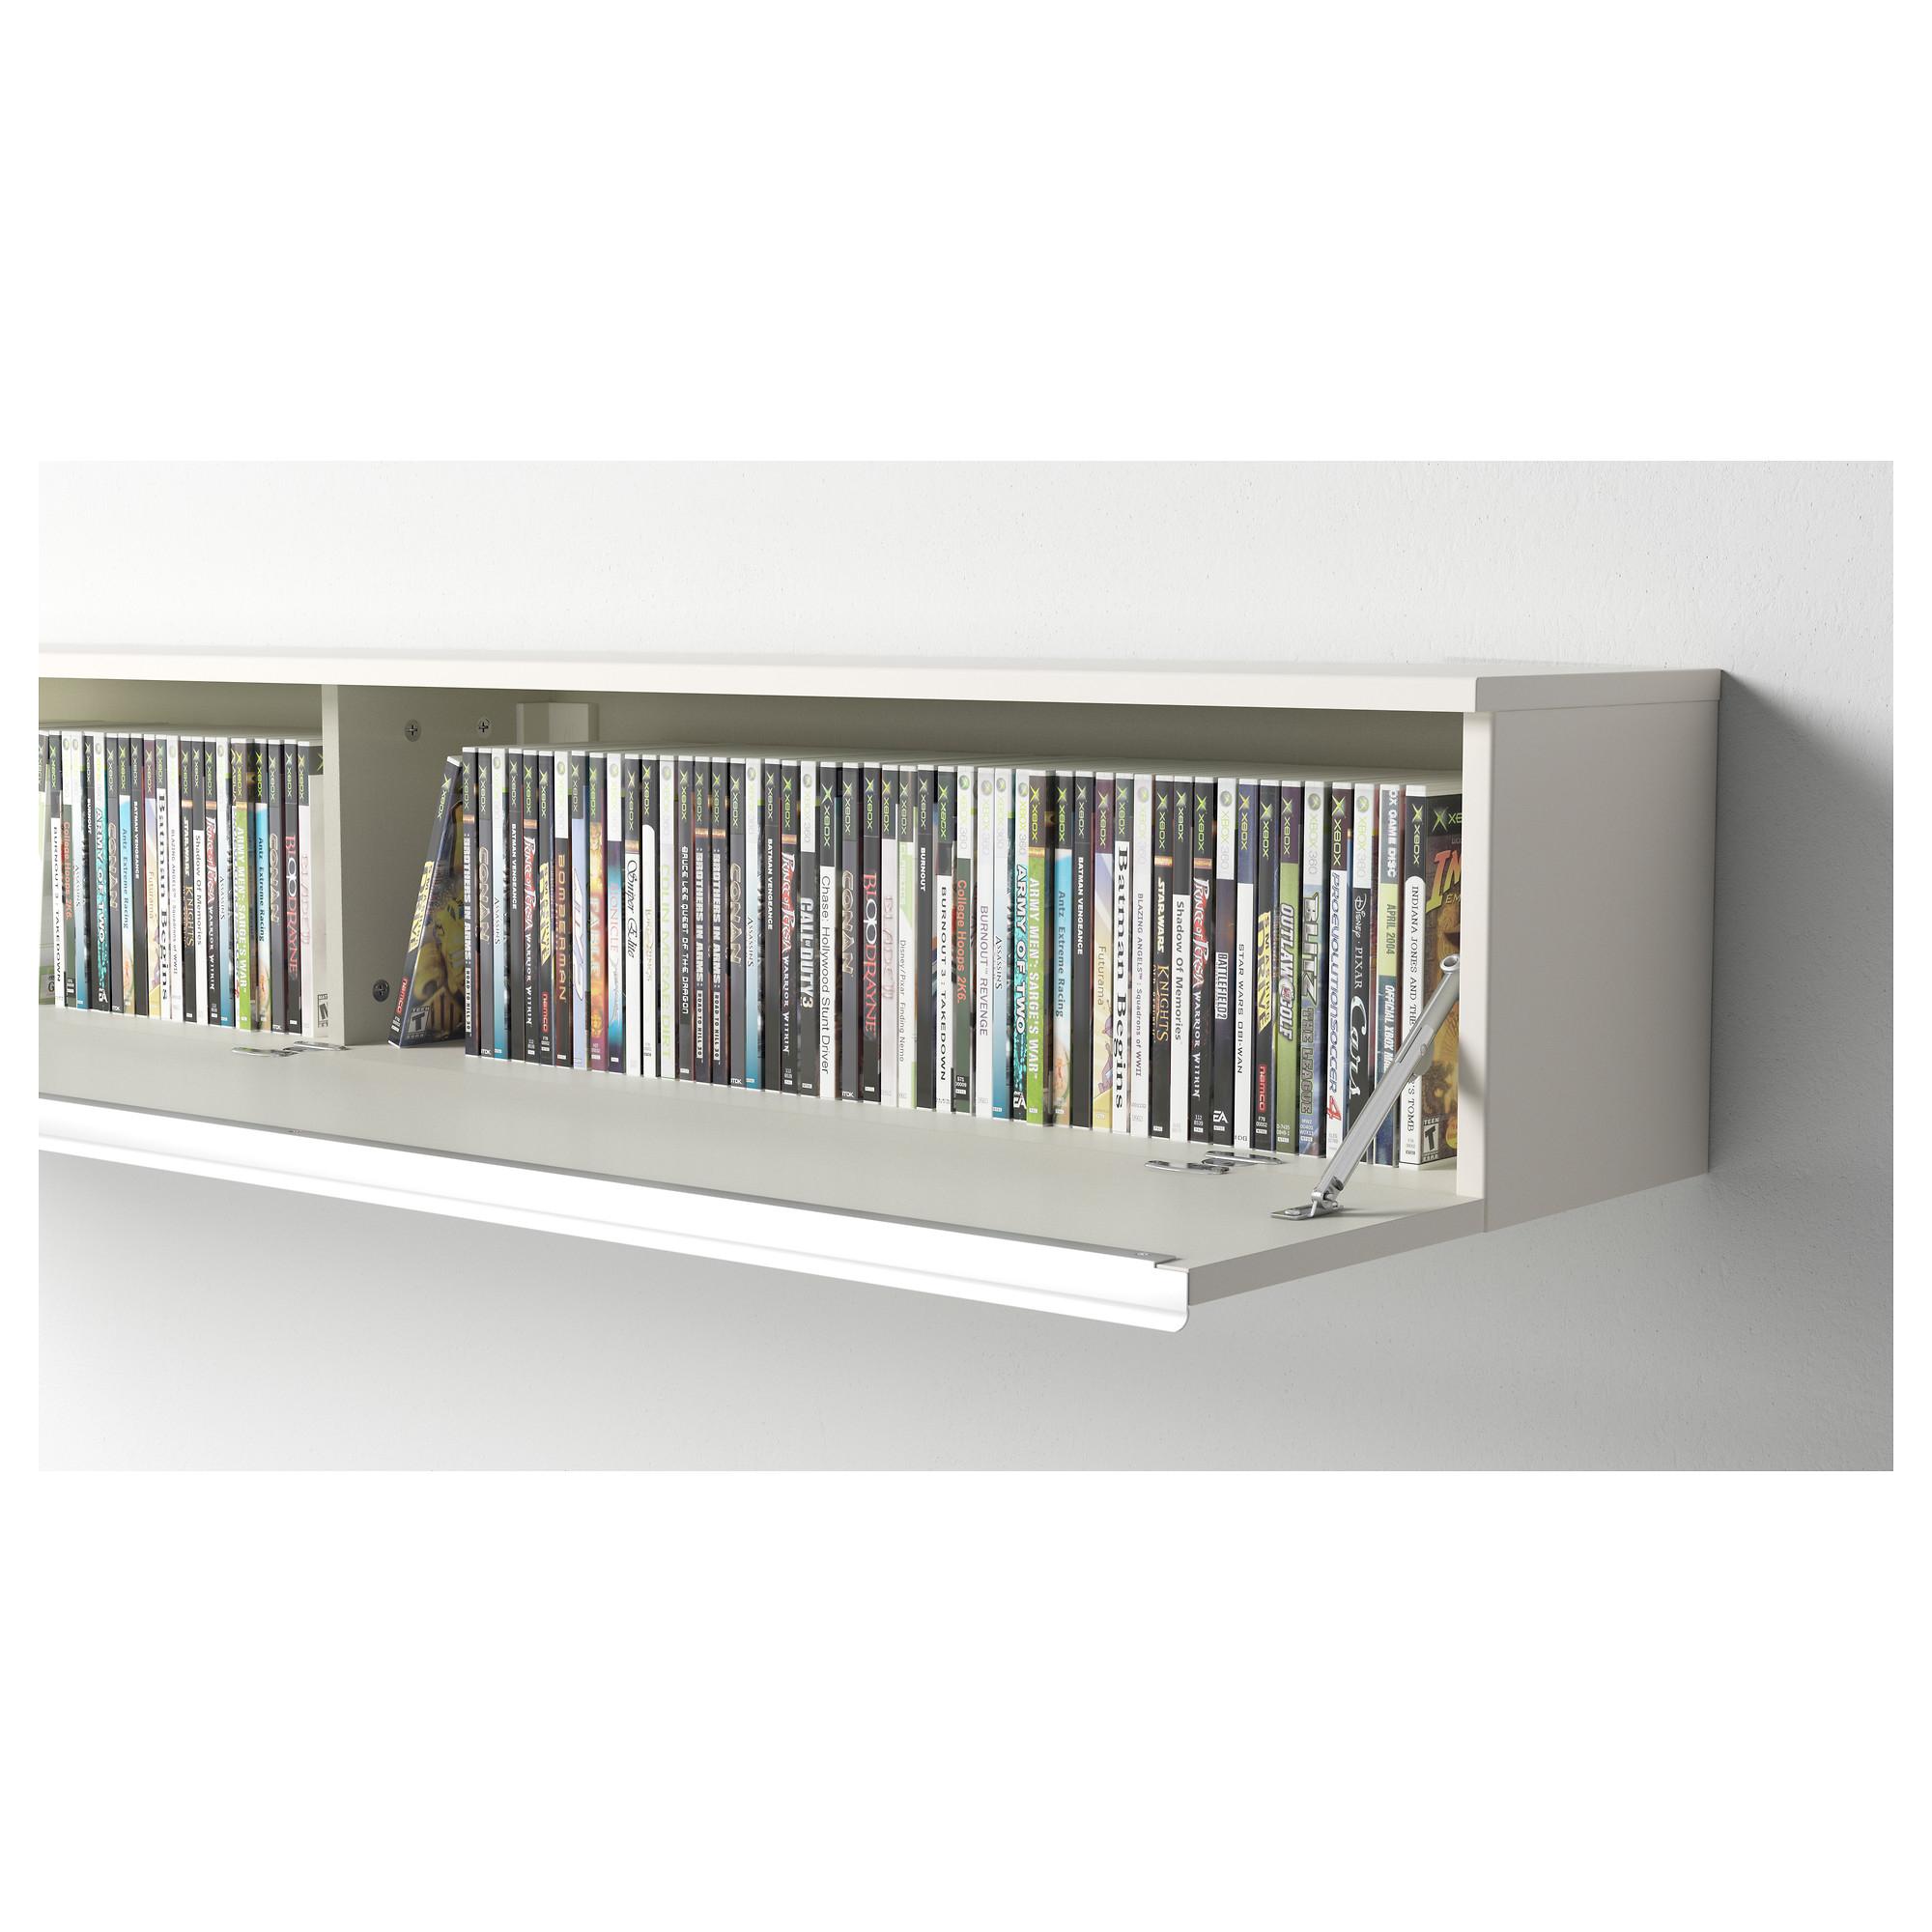 dvd shelf wall mount foter rh foter com wall shelves for dvd movies wall shelf for dvd